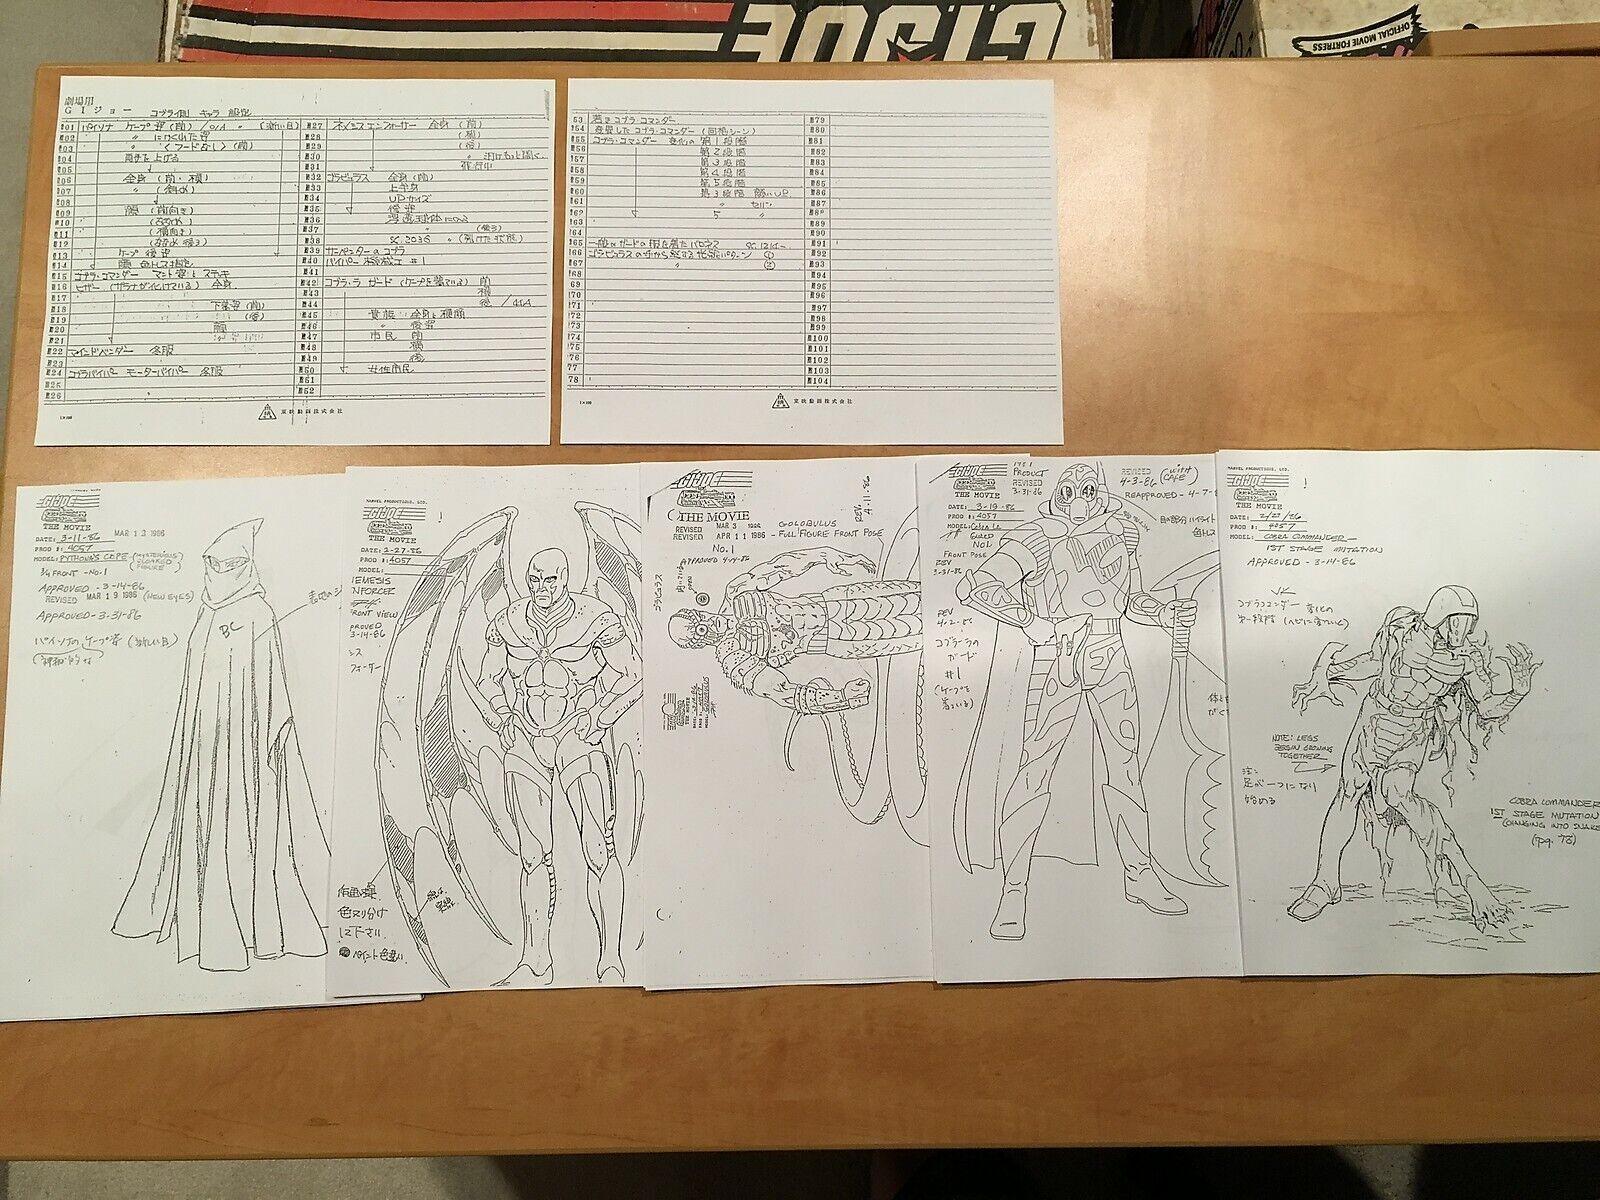 GIJoe Art drawing from Japan GIJoe the movie RARE -PLEASE READ-